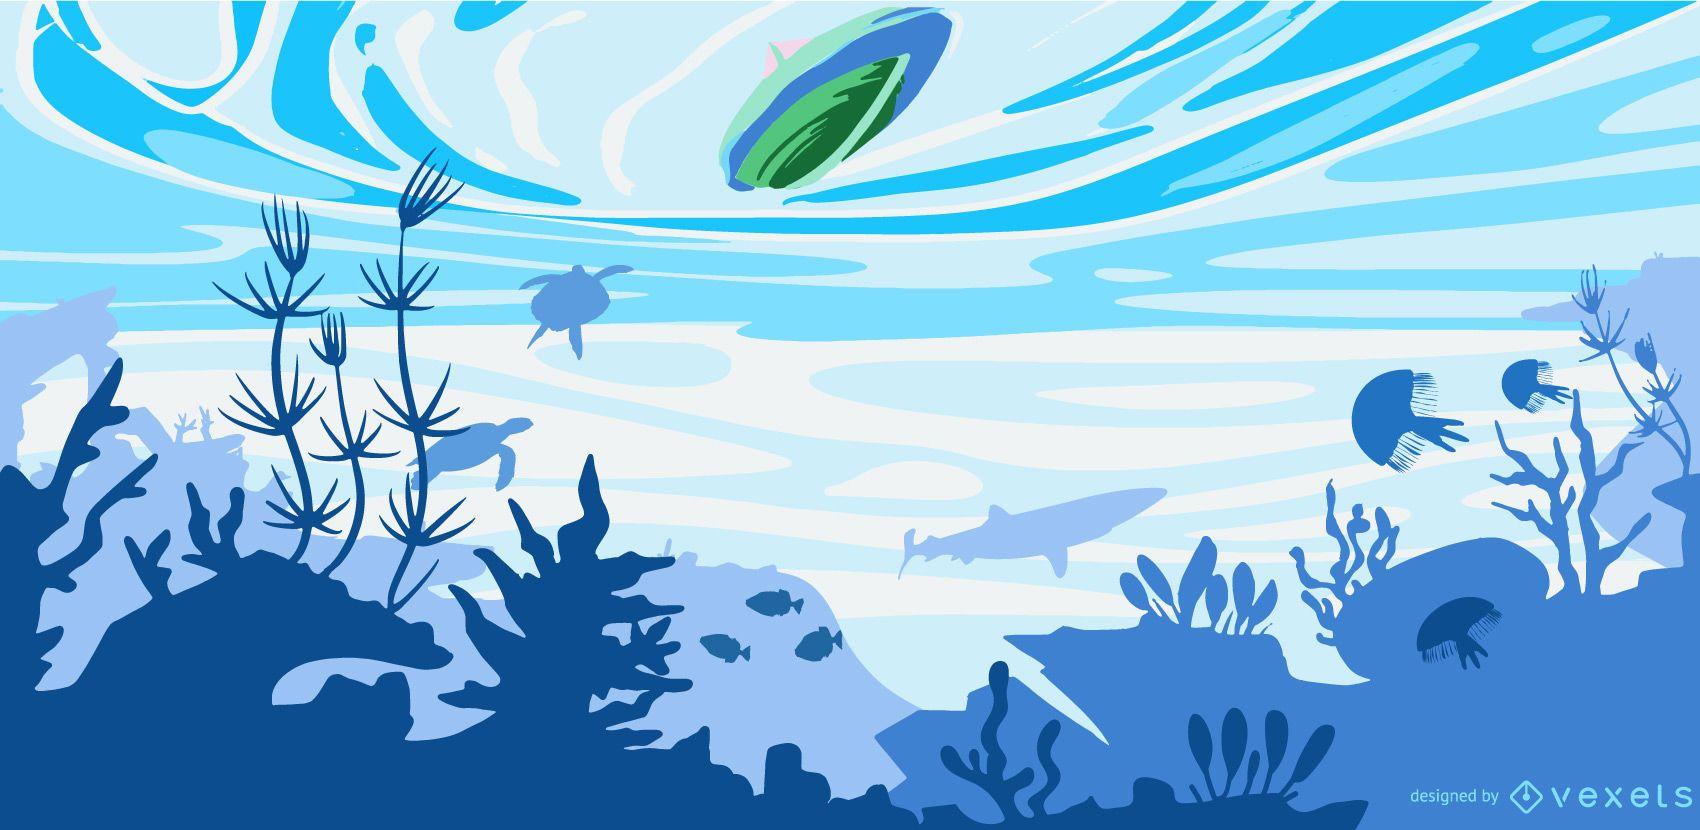 Underwater flat boat illustration